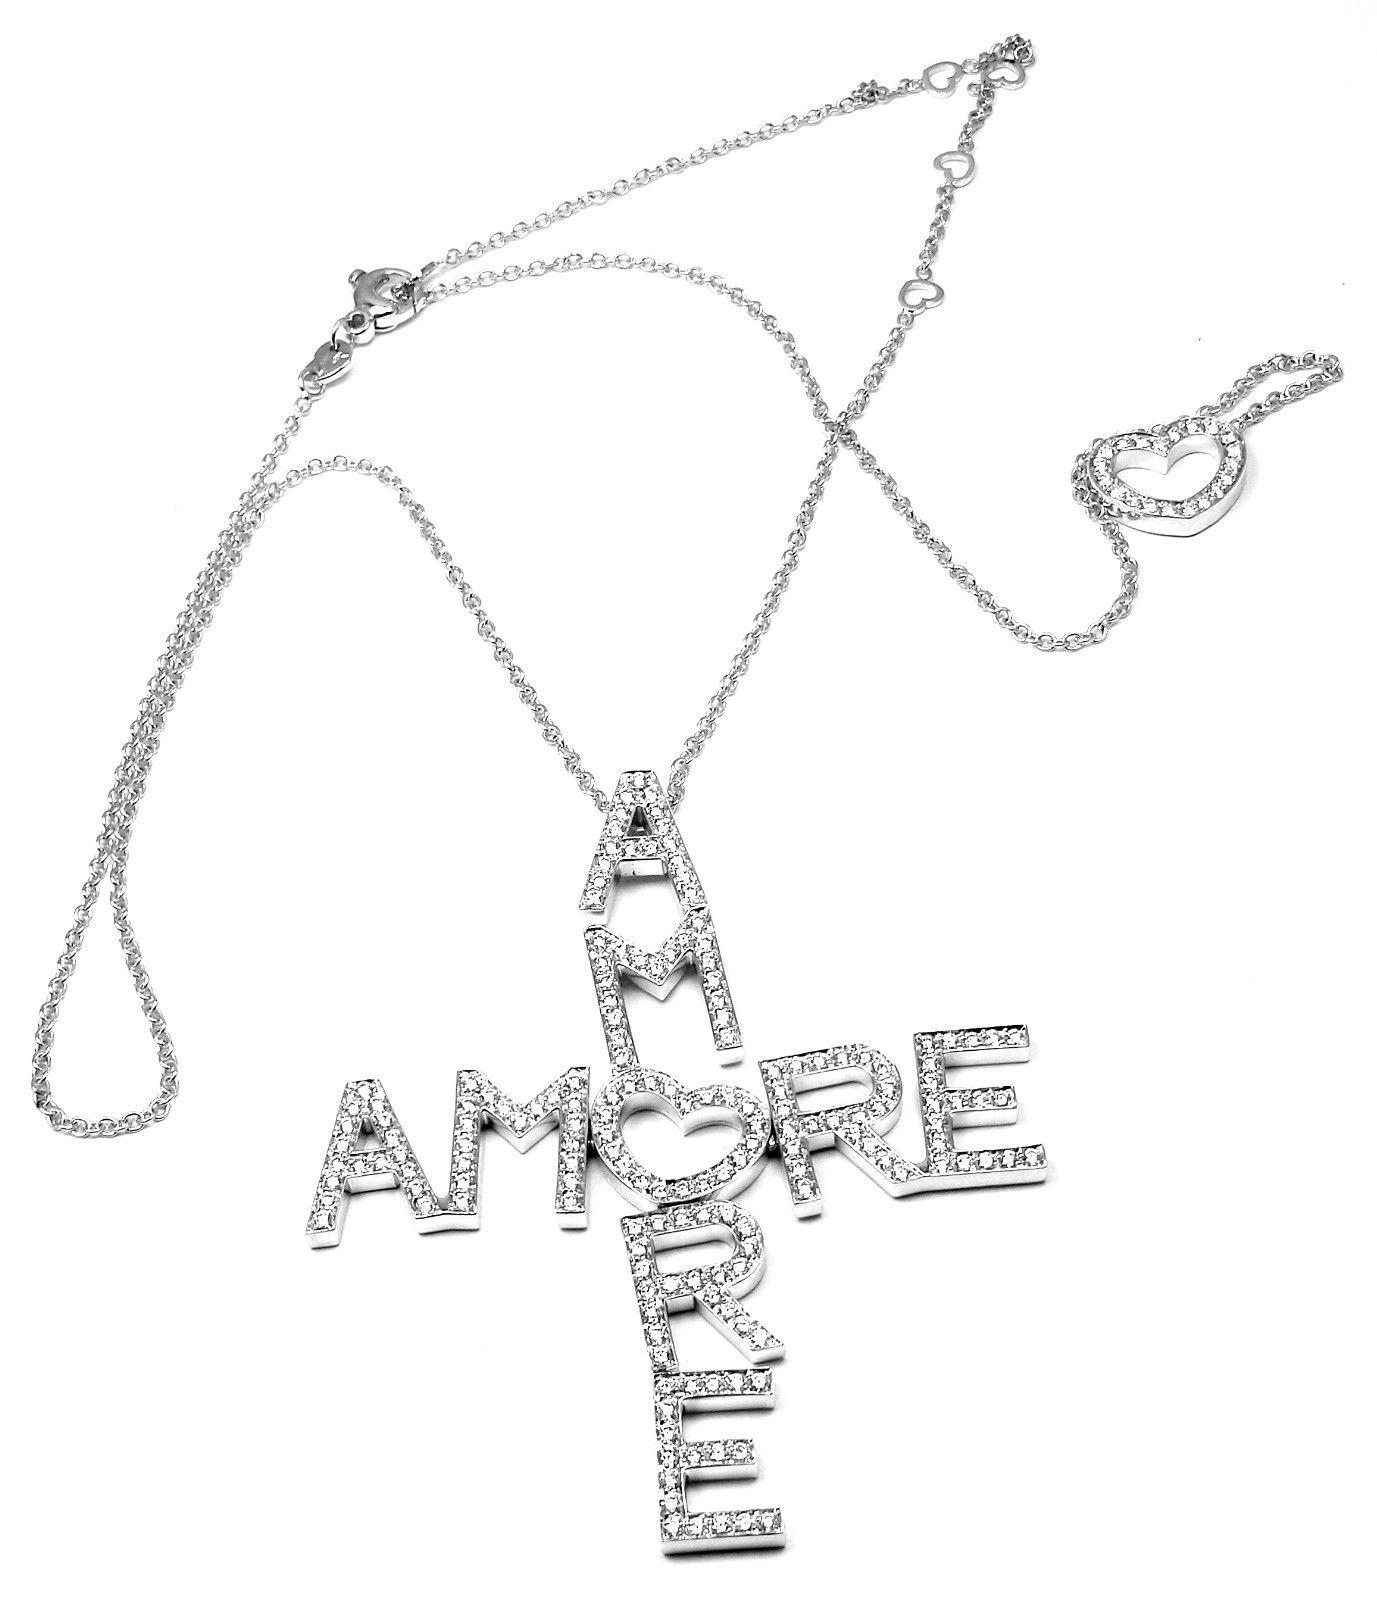 """""Pasquale Bruni Amore 18K White Gold 5.02ct Diamond Pendant Necklace"""""" 558991"